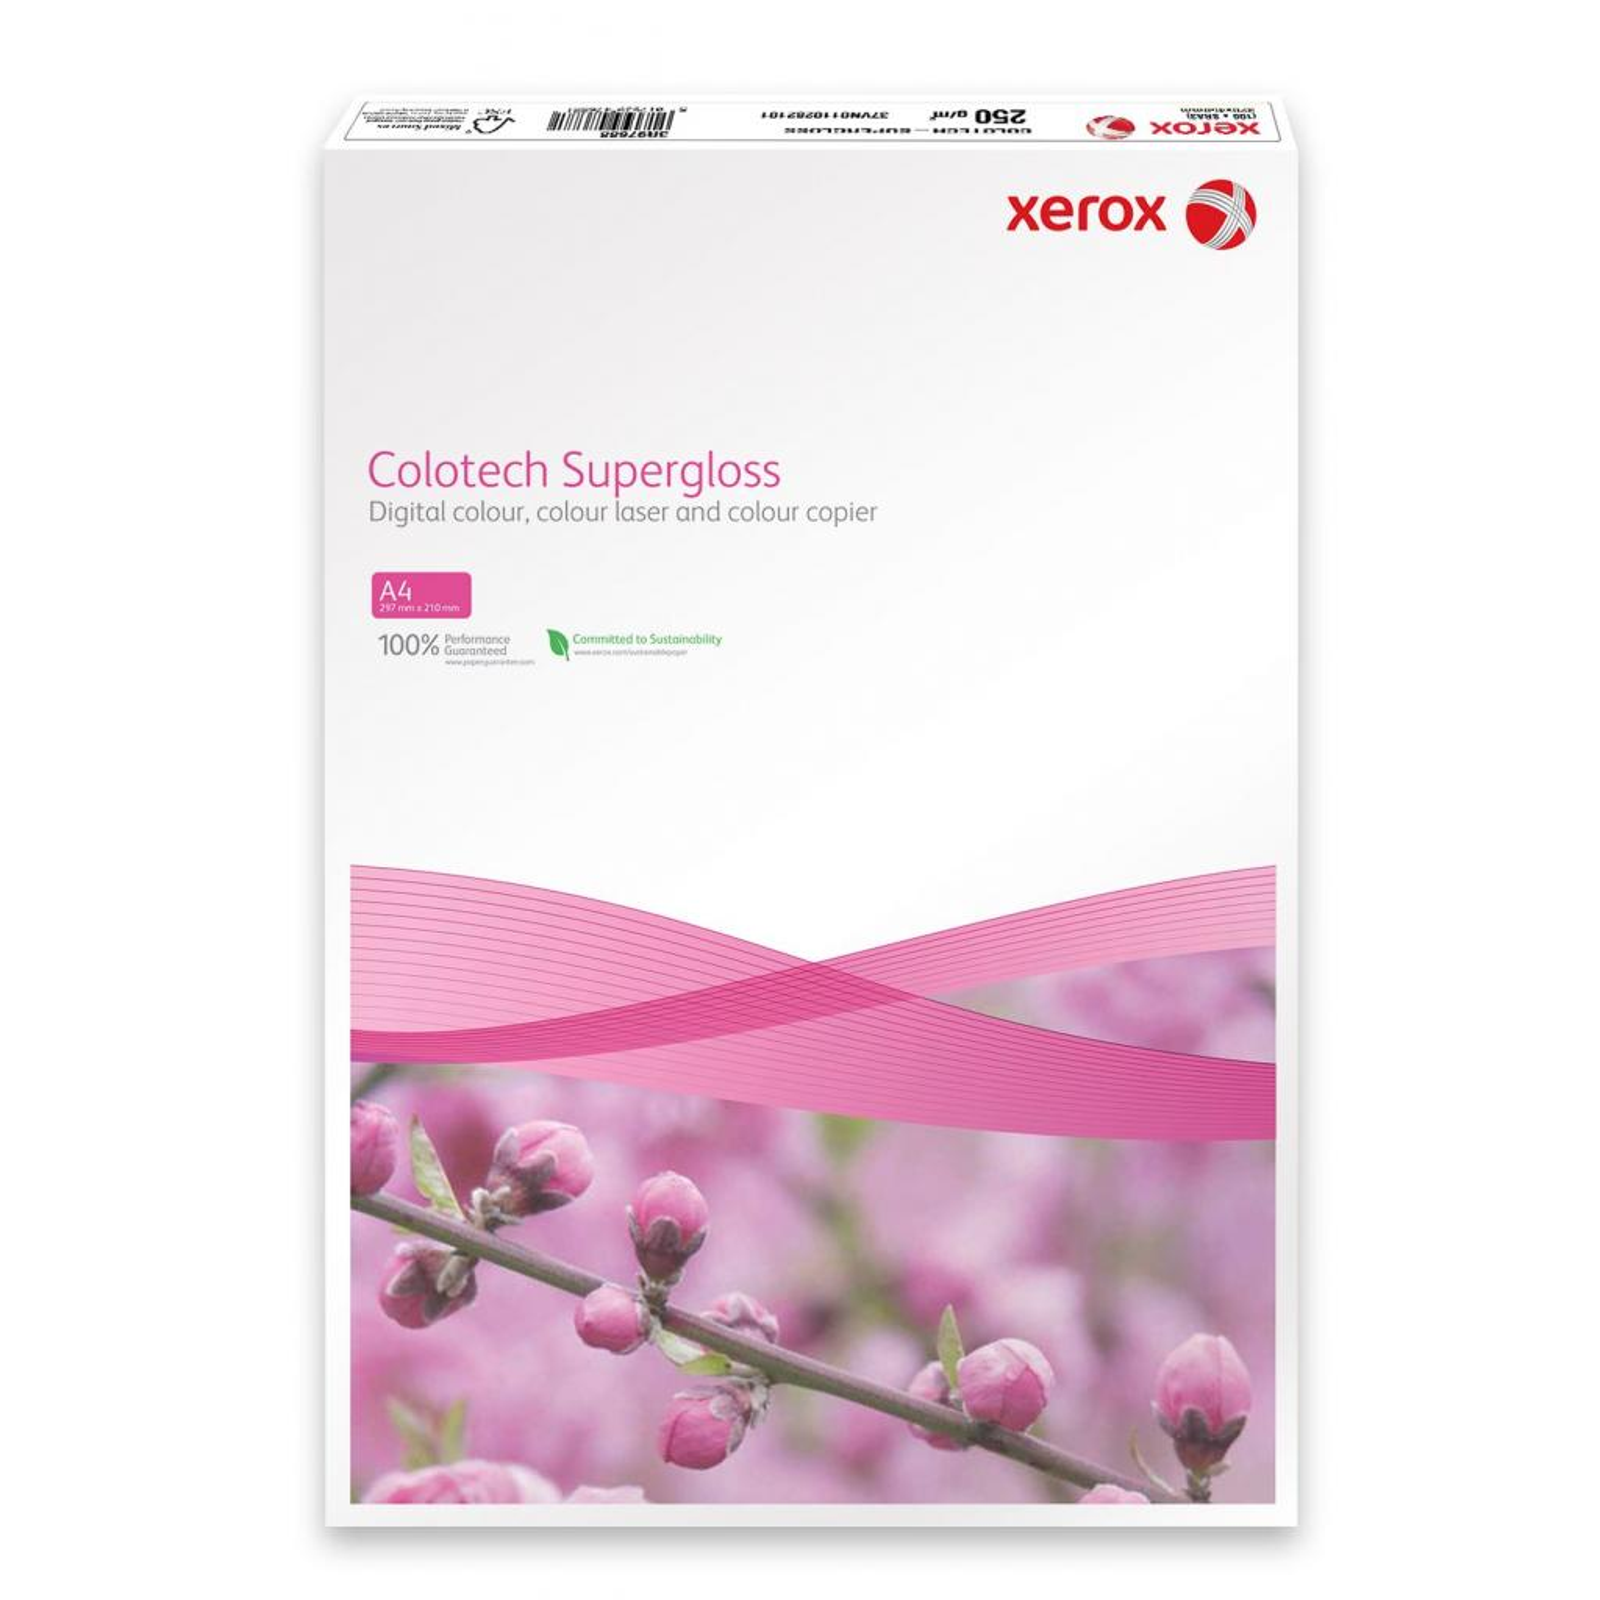 Бумага XEROX A3 COLOTECH + SUPERGLOSS (003R97687)